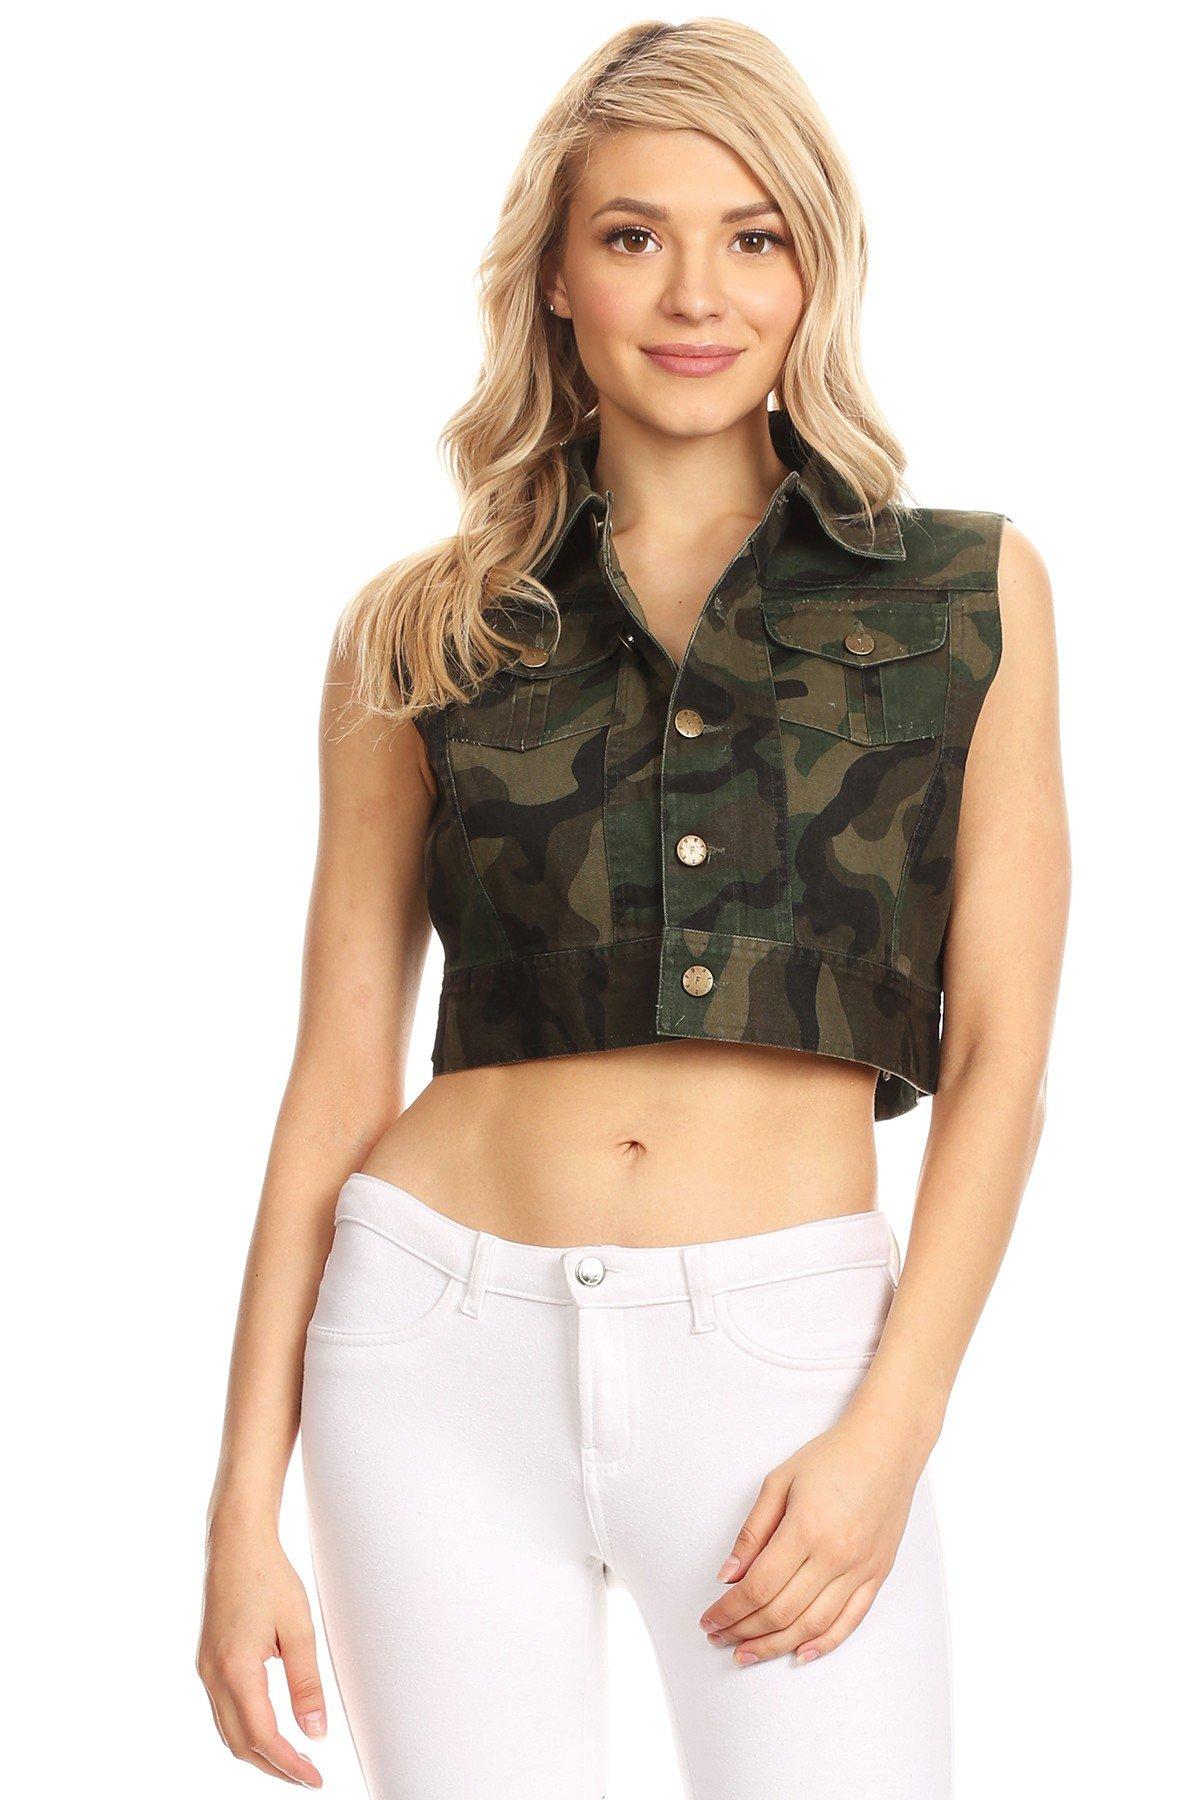 Funteze Cropped Army Print Button Up Vest (Large)